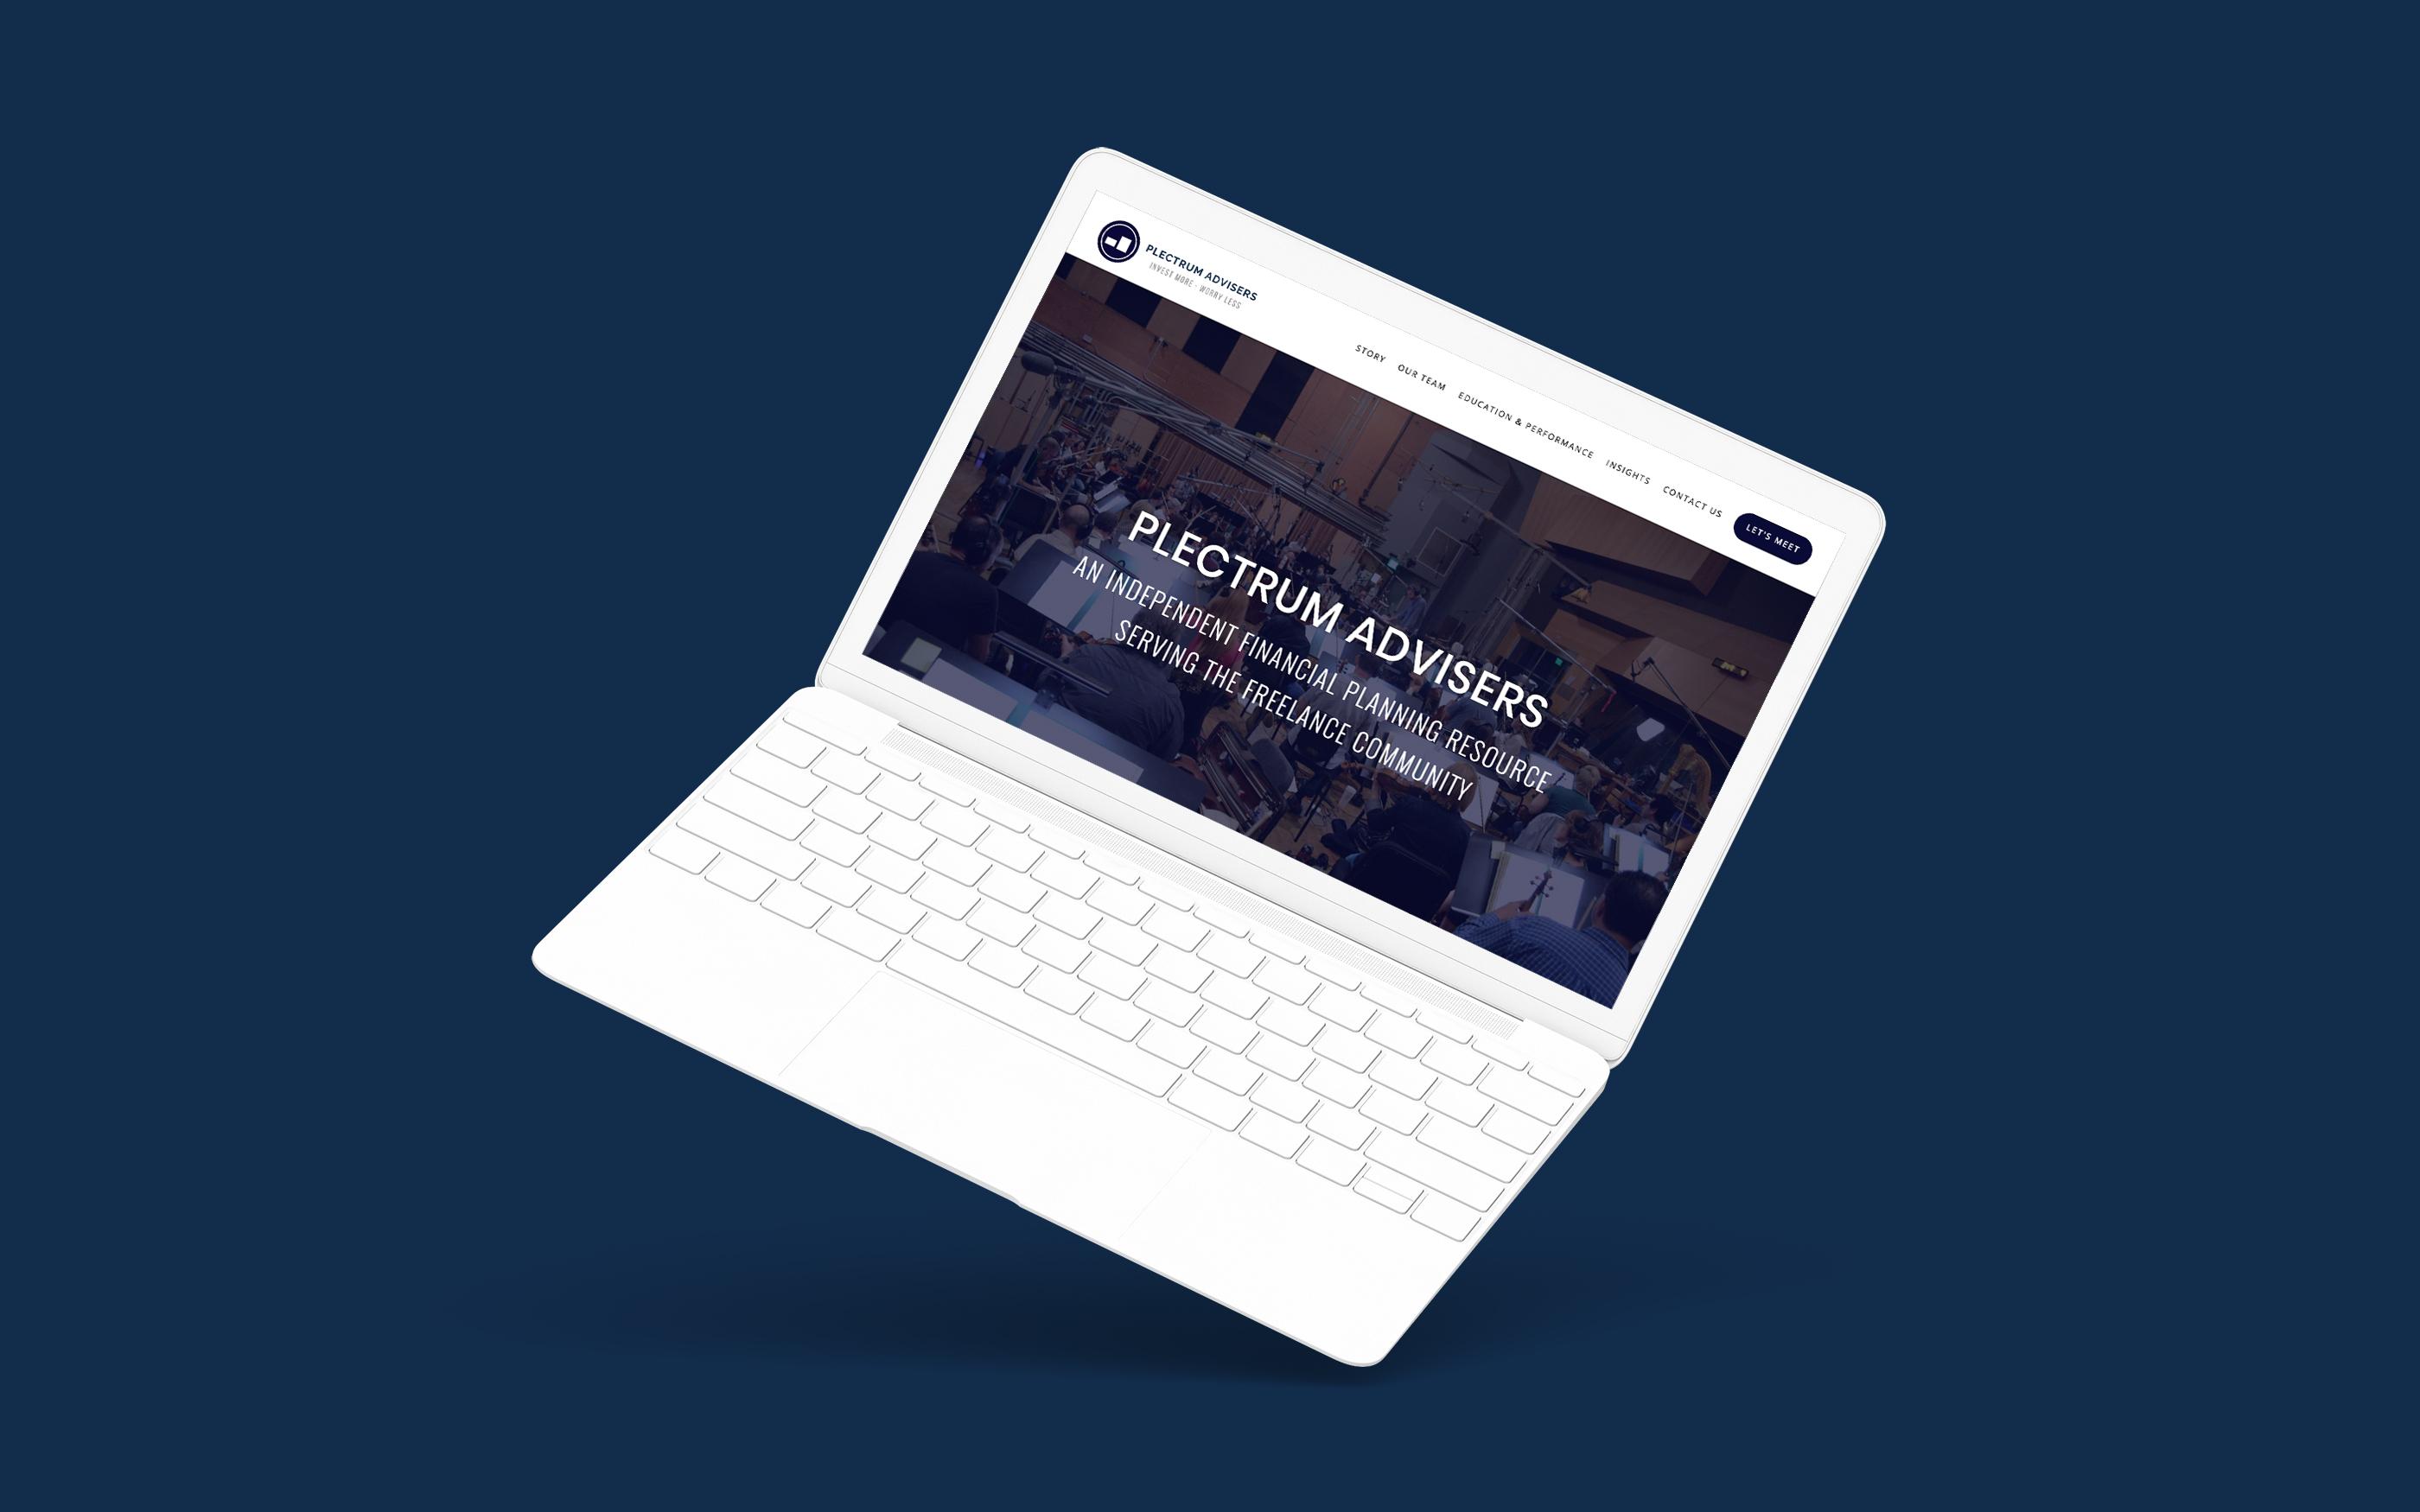 Financial Advisor Website Showcase: Plectrum Advisers